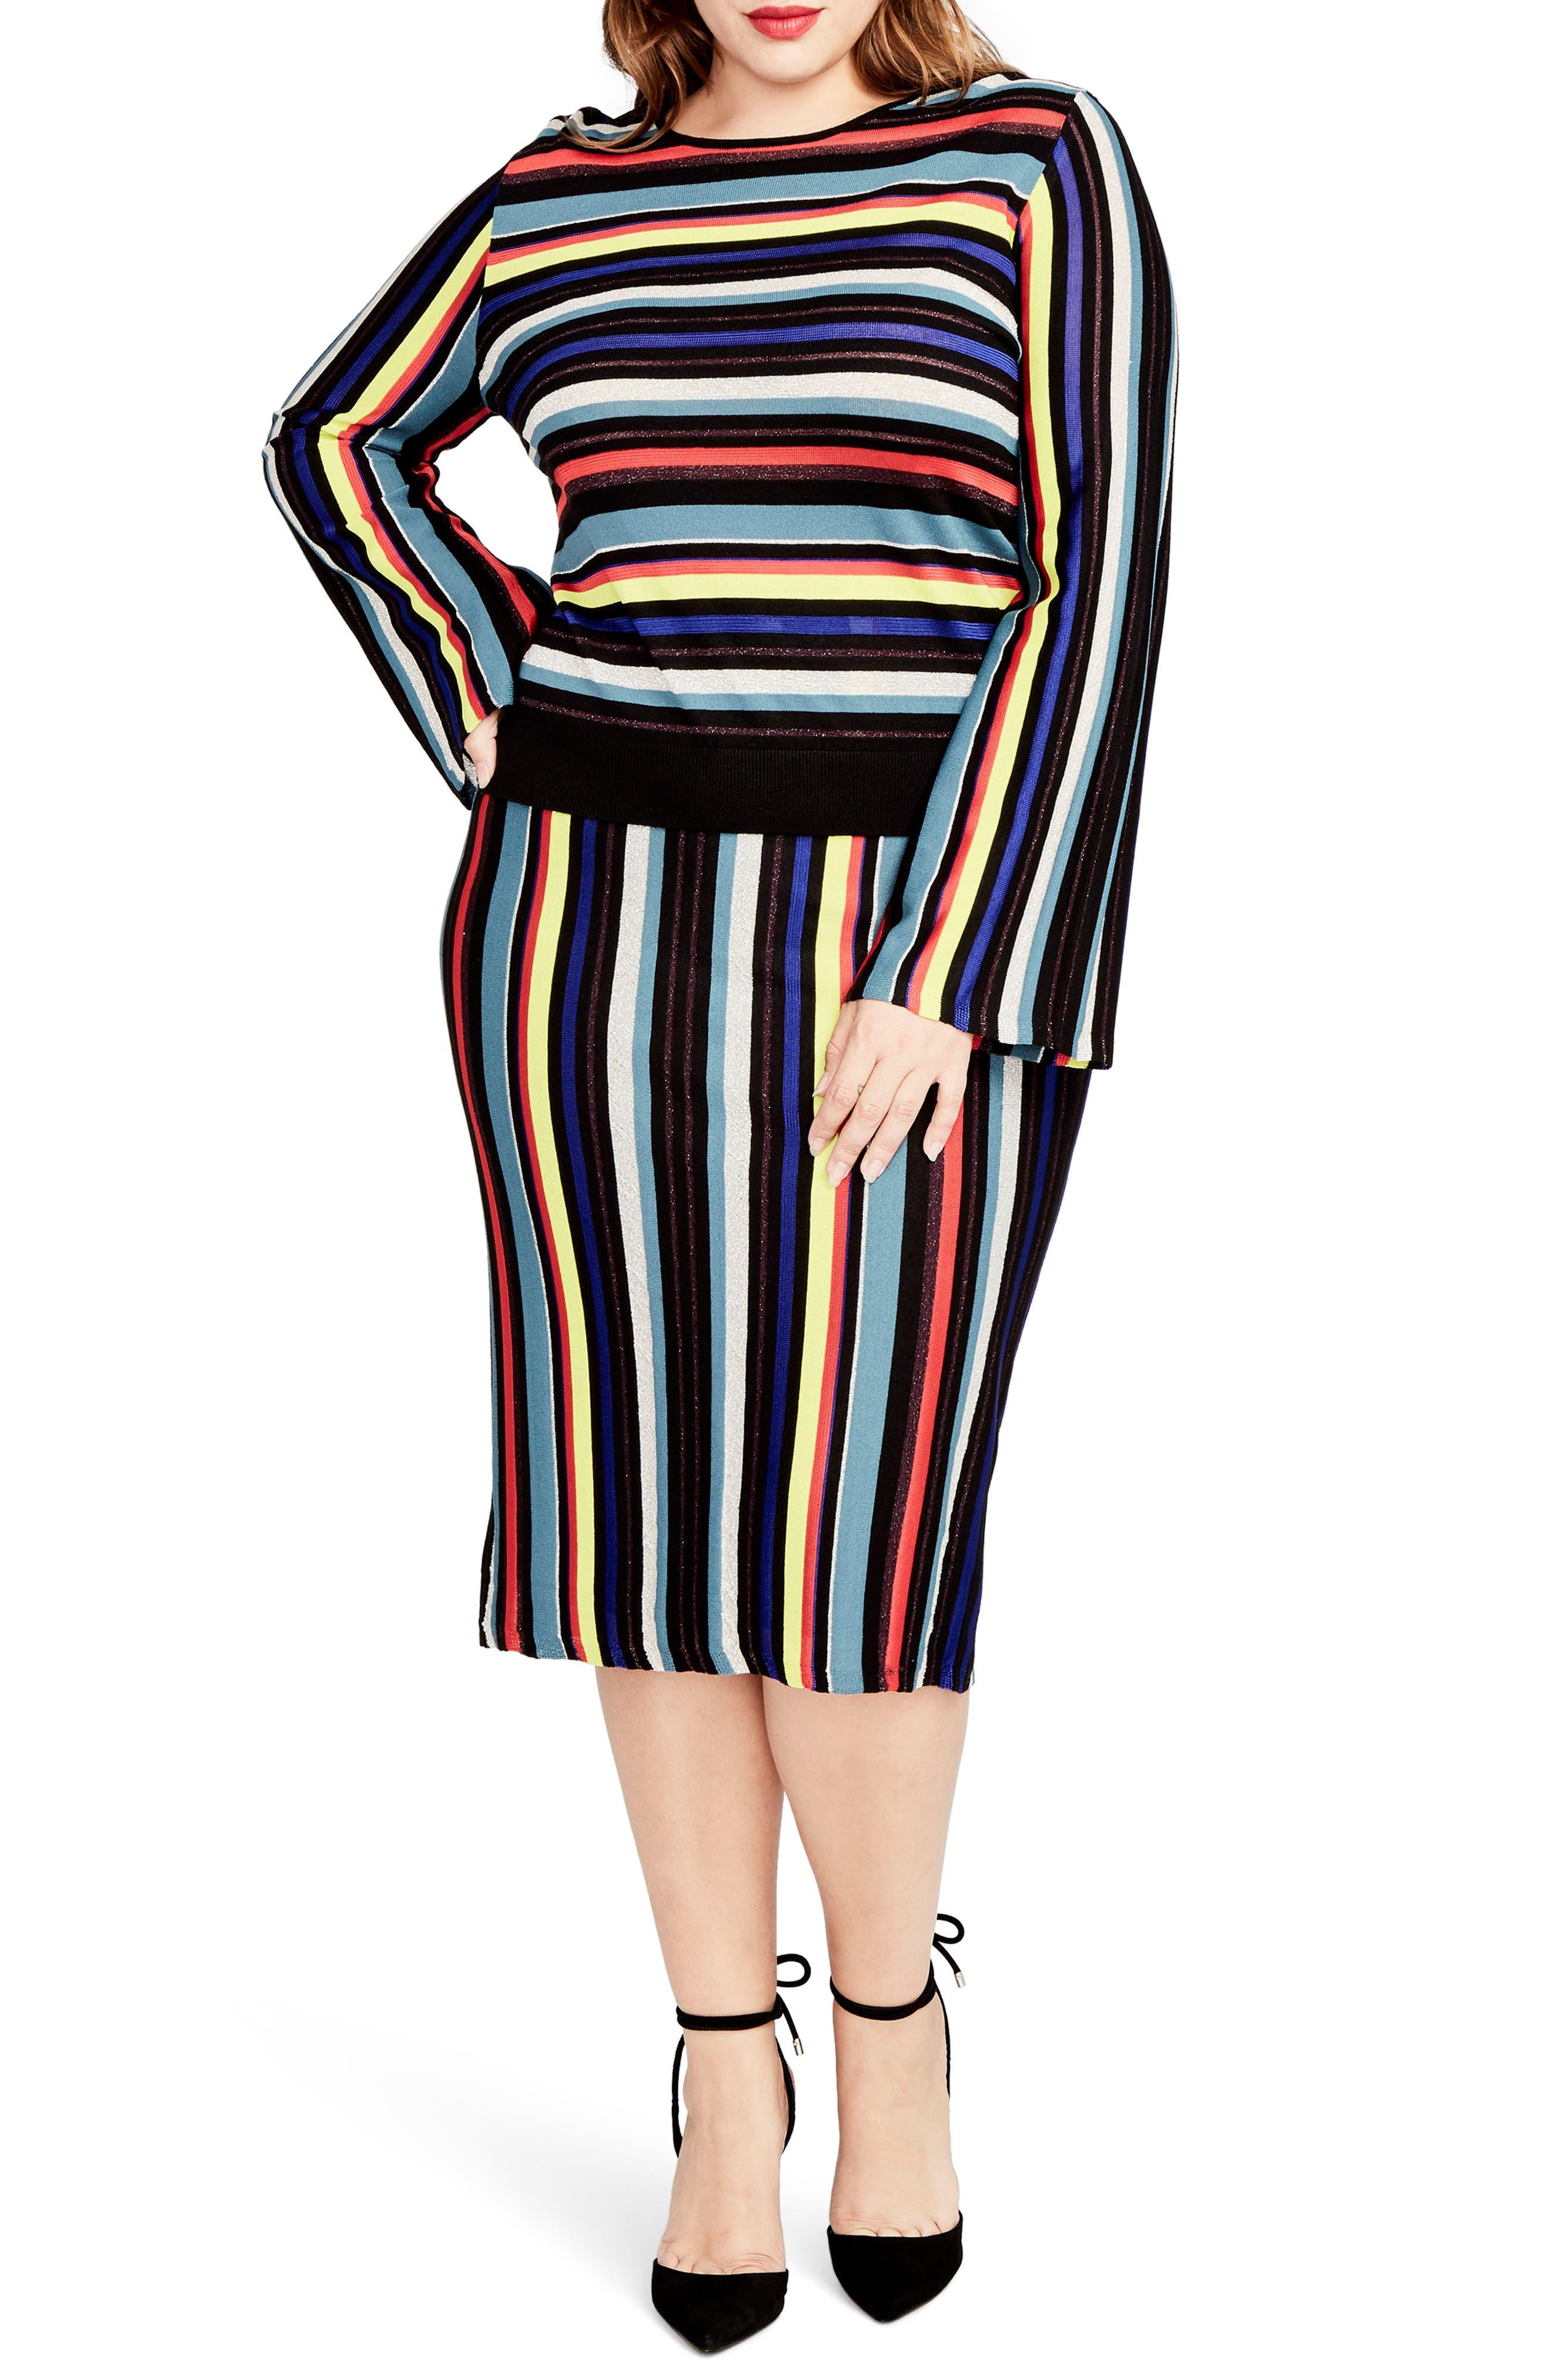 Alternate Image 1 Selected - RACHEL Rachel Roy Multistripe Knit Skirt (Plus Size)